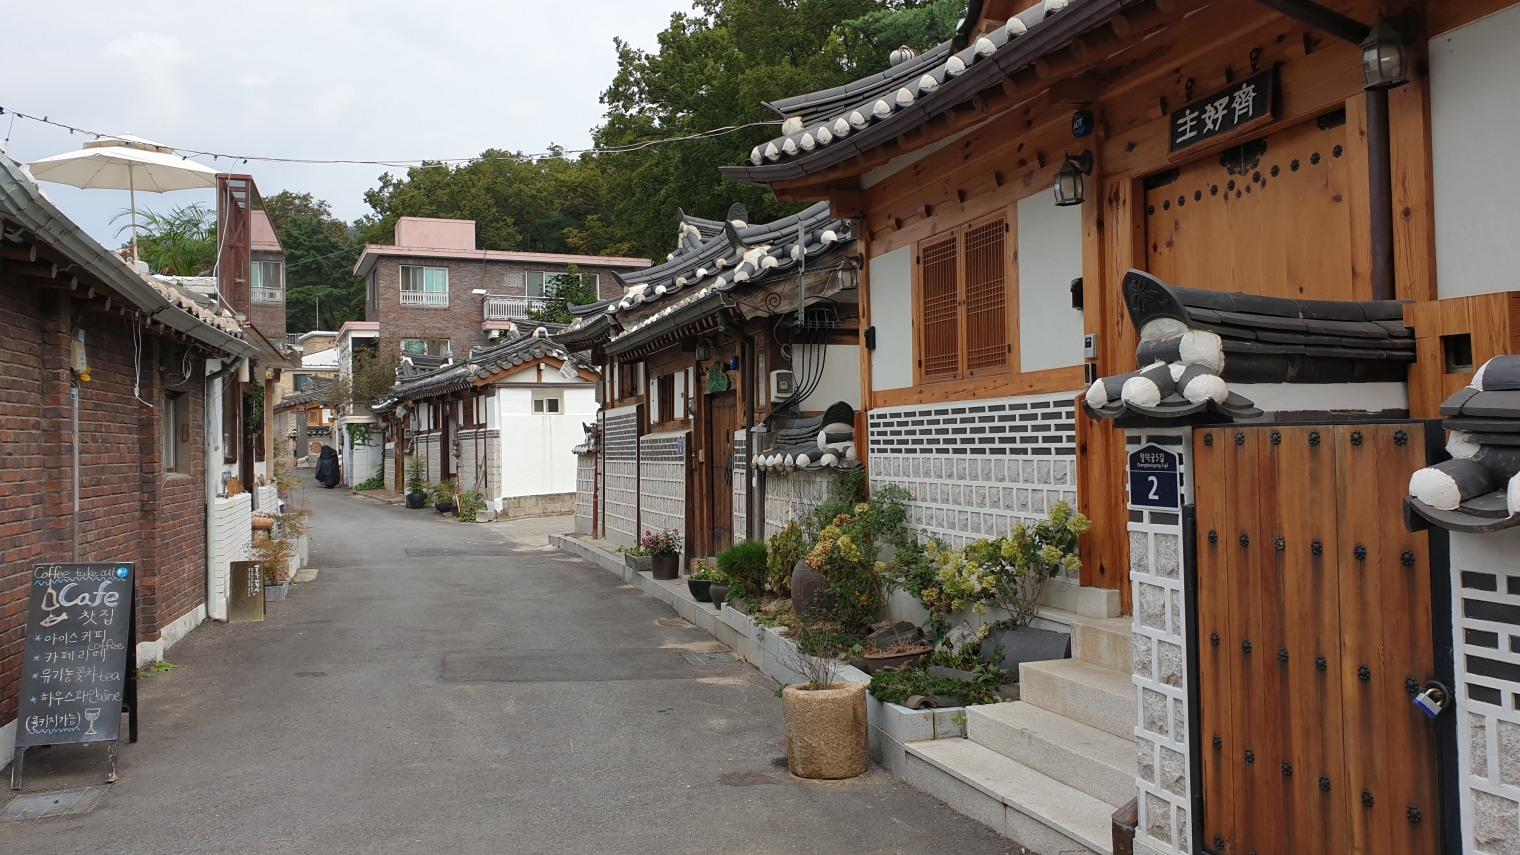 Korea0075